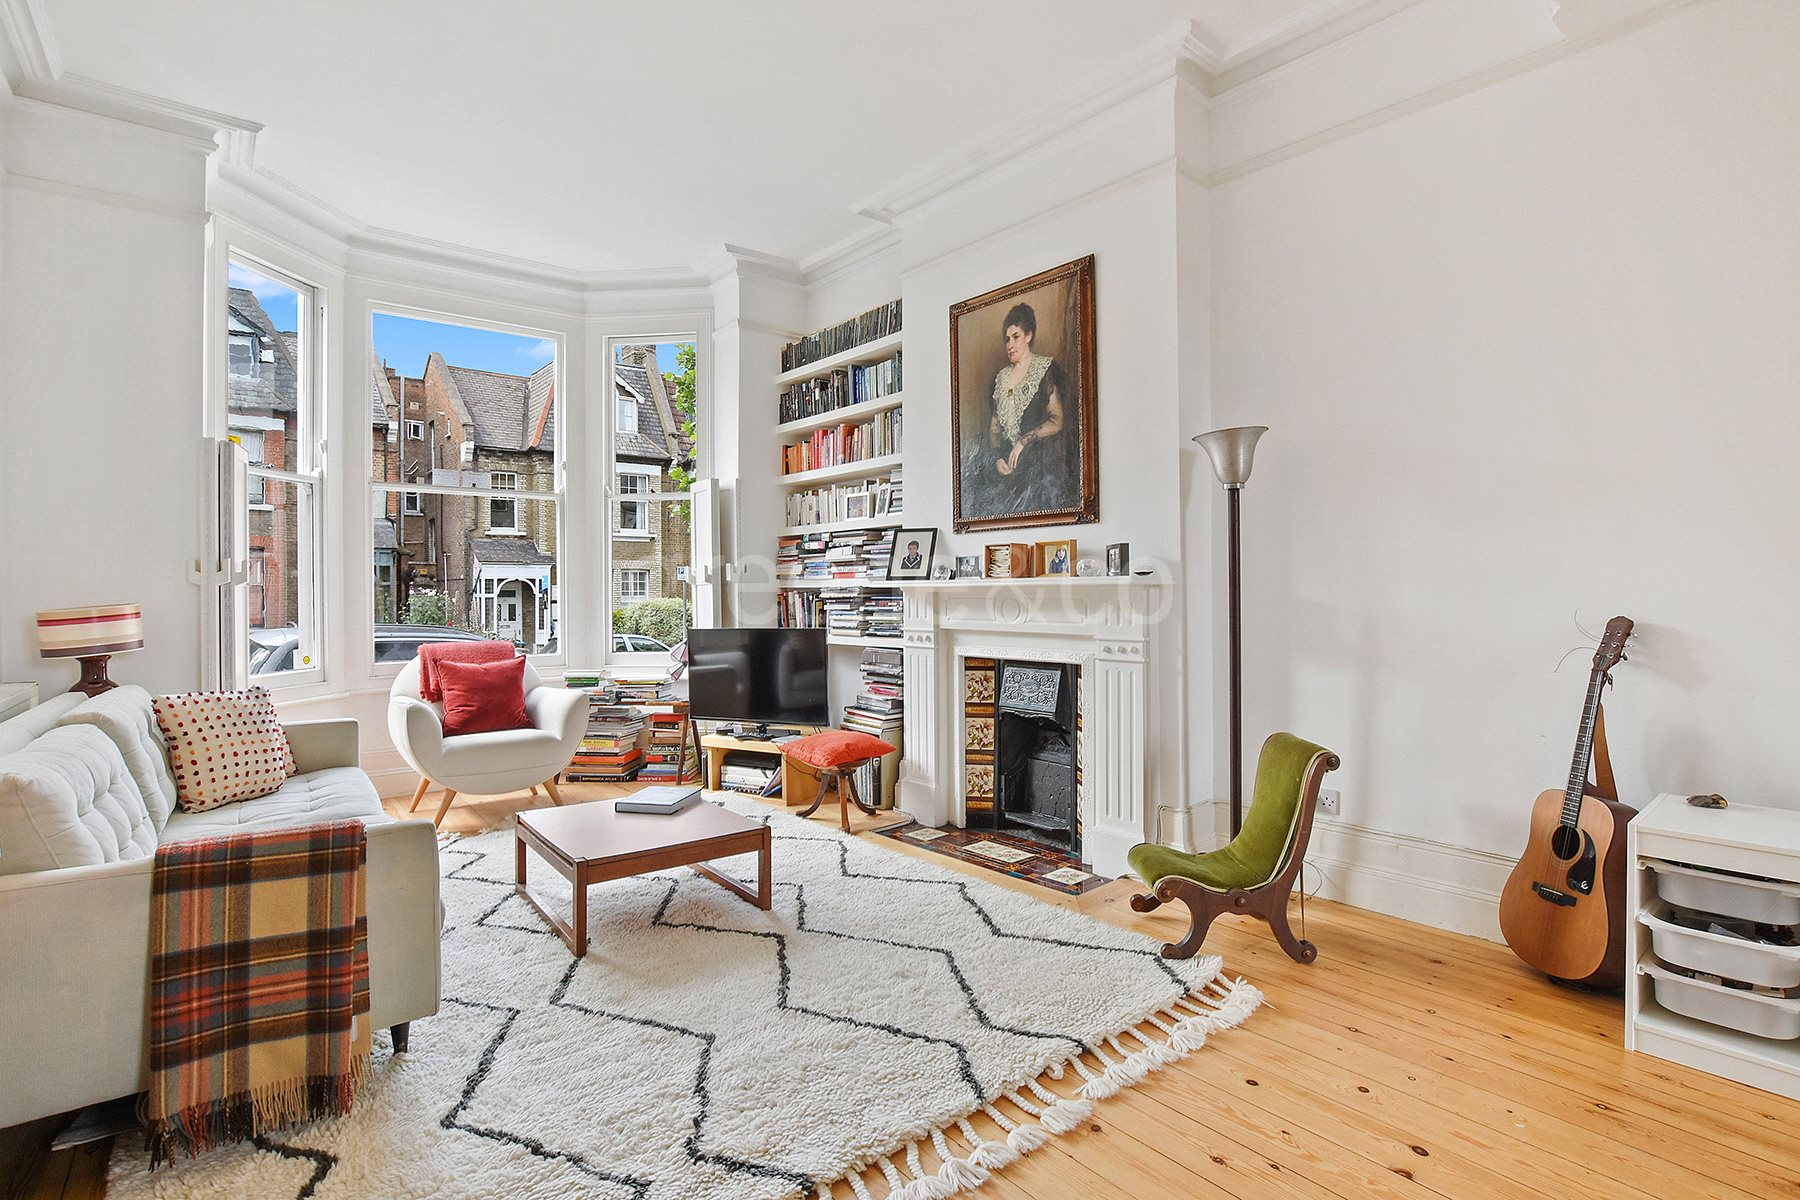 3 Bedrooms Maisonette Flat for sale in Dyne Road, London, NW6